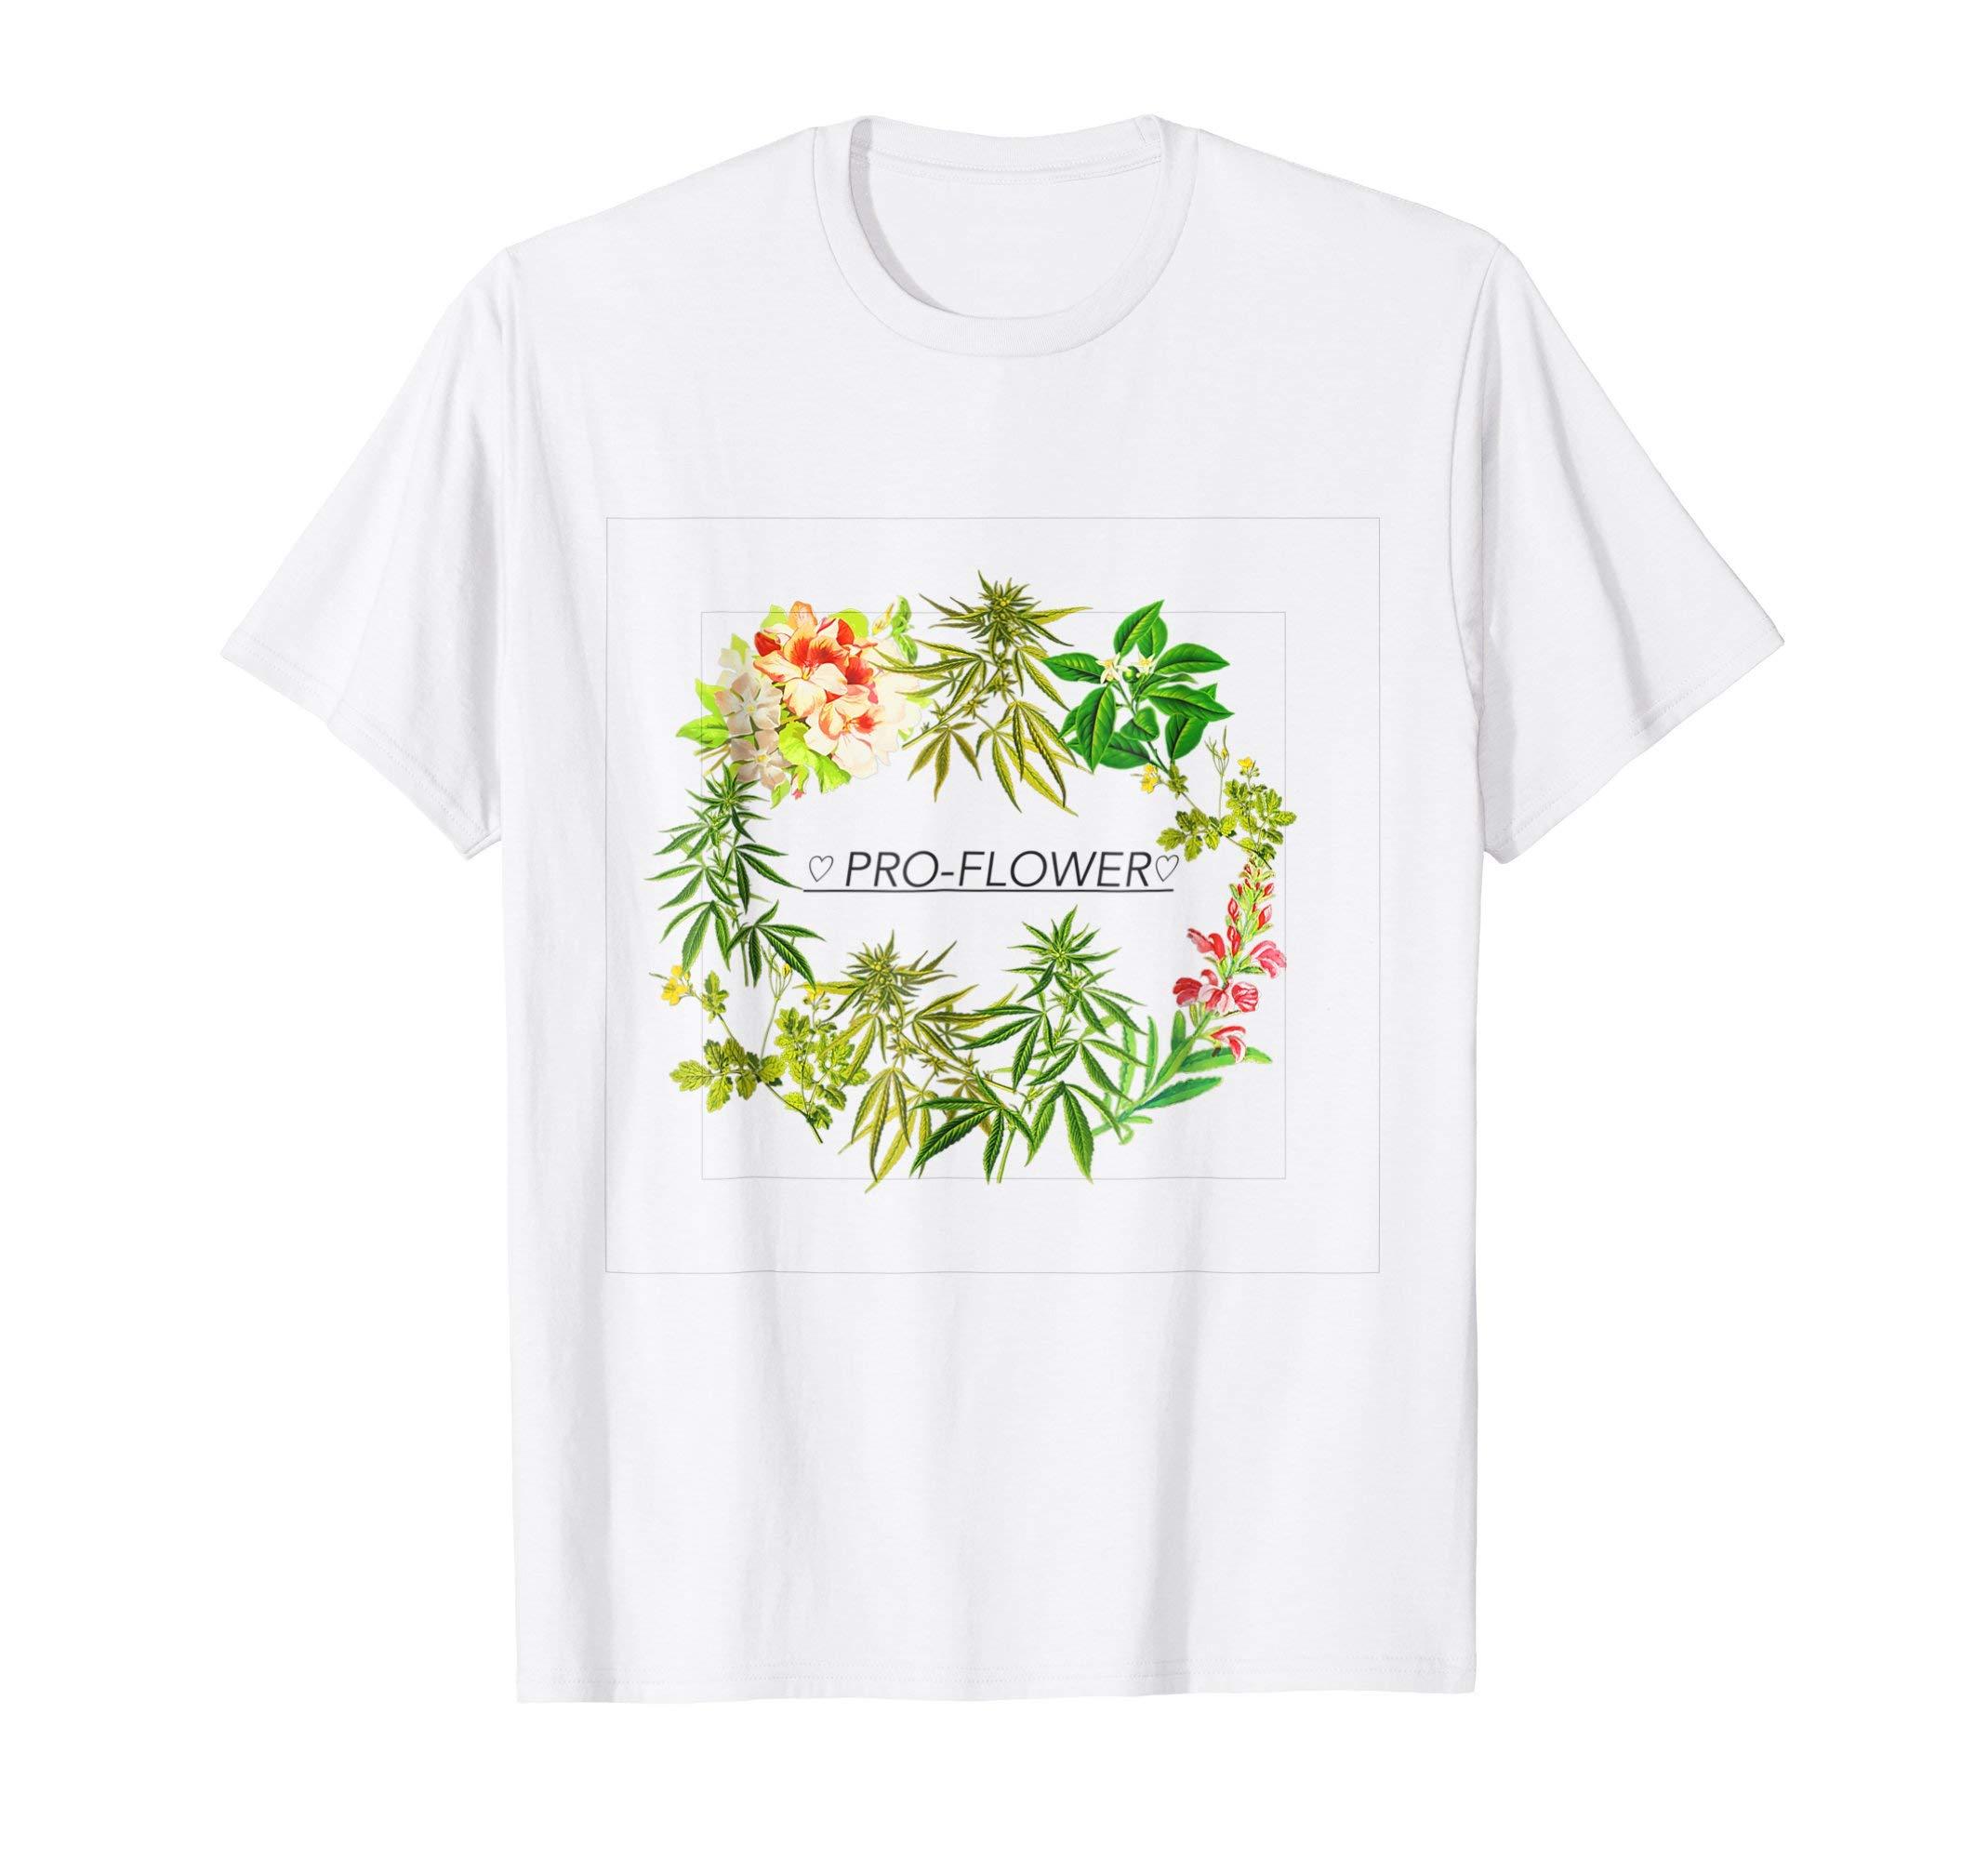 PRO-FLOWER Aesthetic Cannabis Floral Print T-Shirt